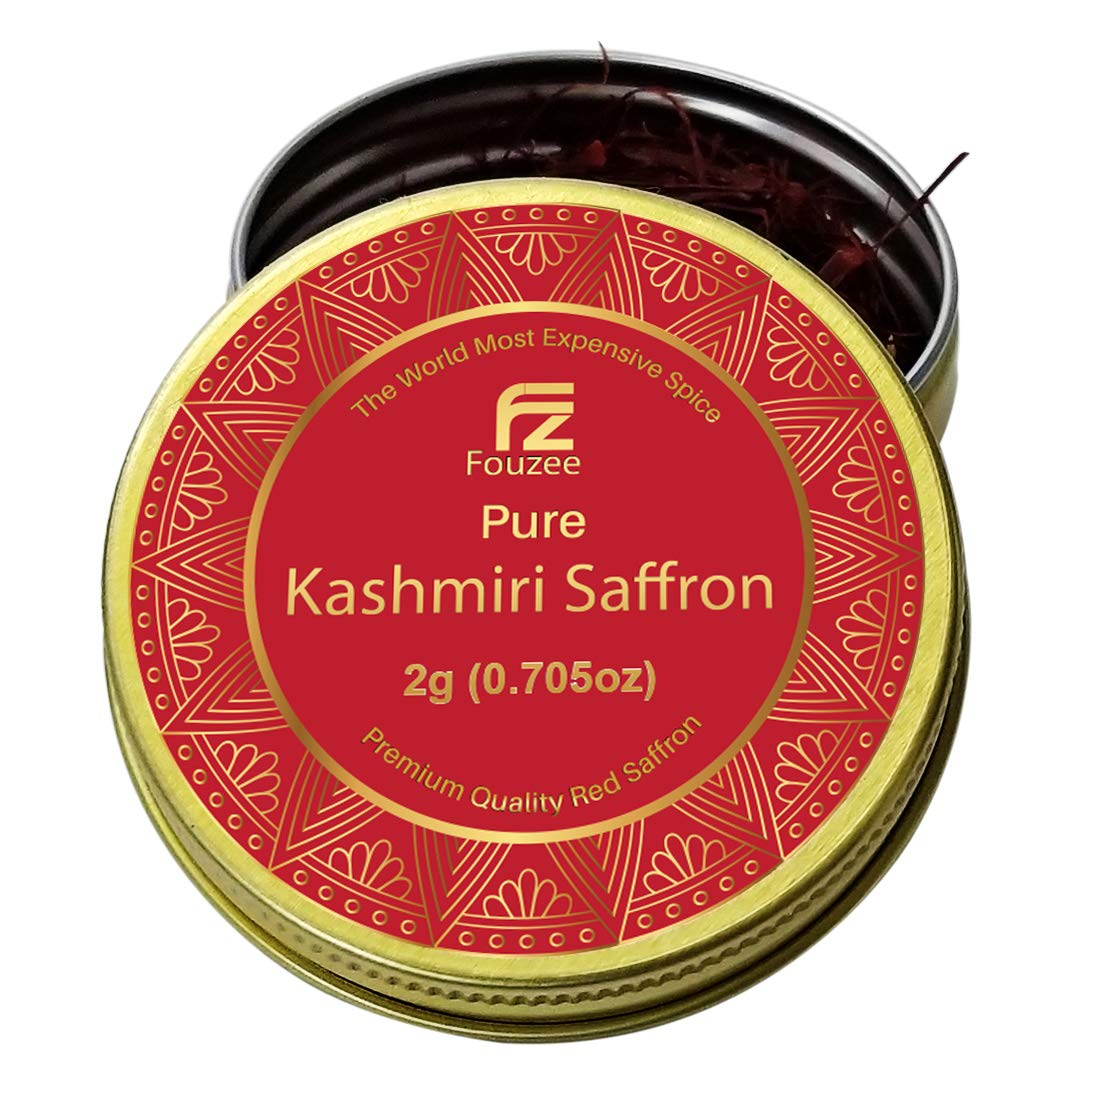 Fouzee Pure Kashmiri Saffron Threads 0.0705oz 2g - Finest 100% All-Red Saffron Spice For Cooking, Paella Rice, Golden Milk, Persian Rice, Tea by Fouzee